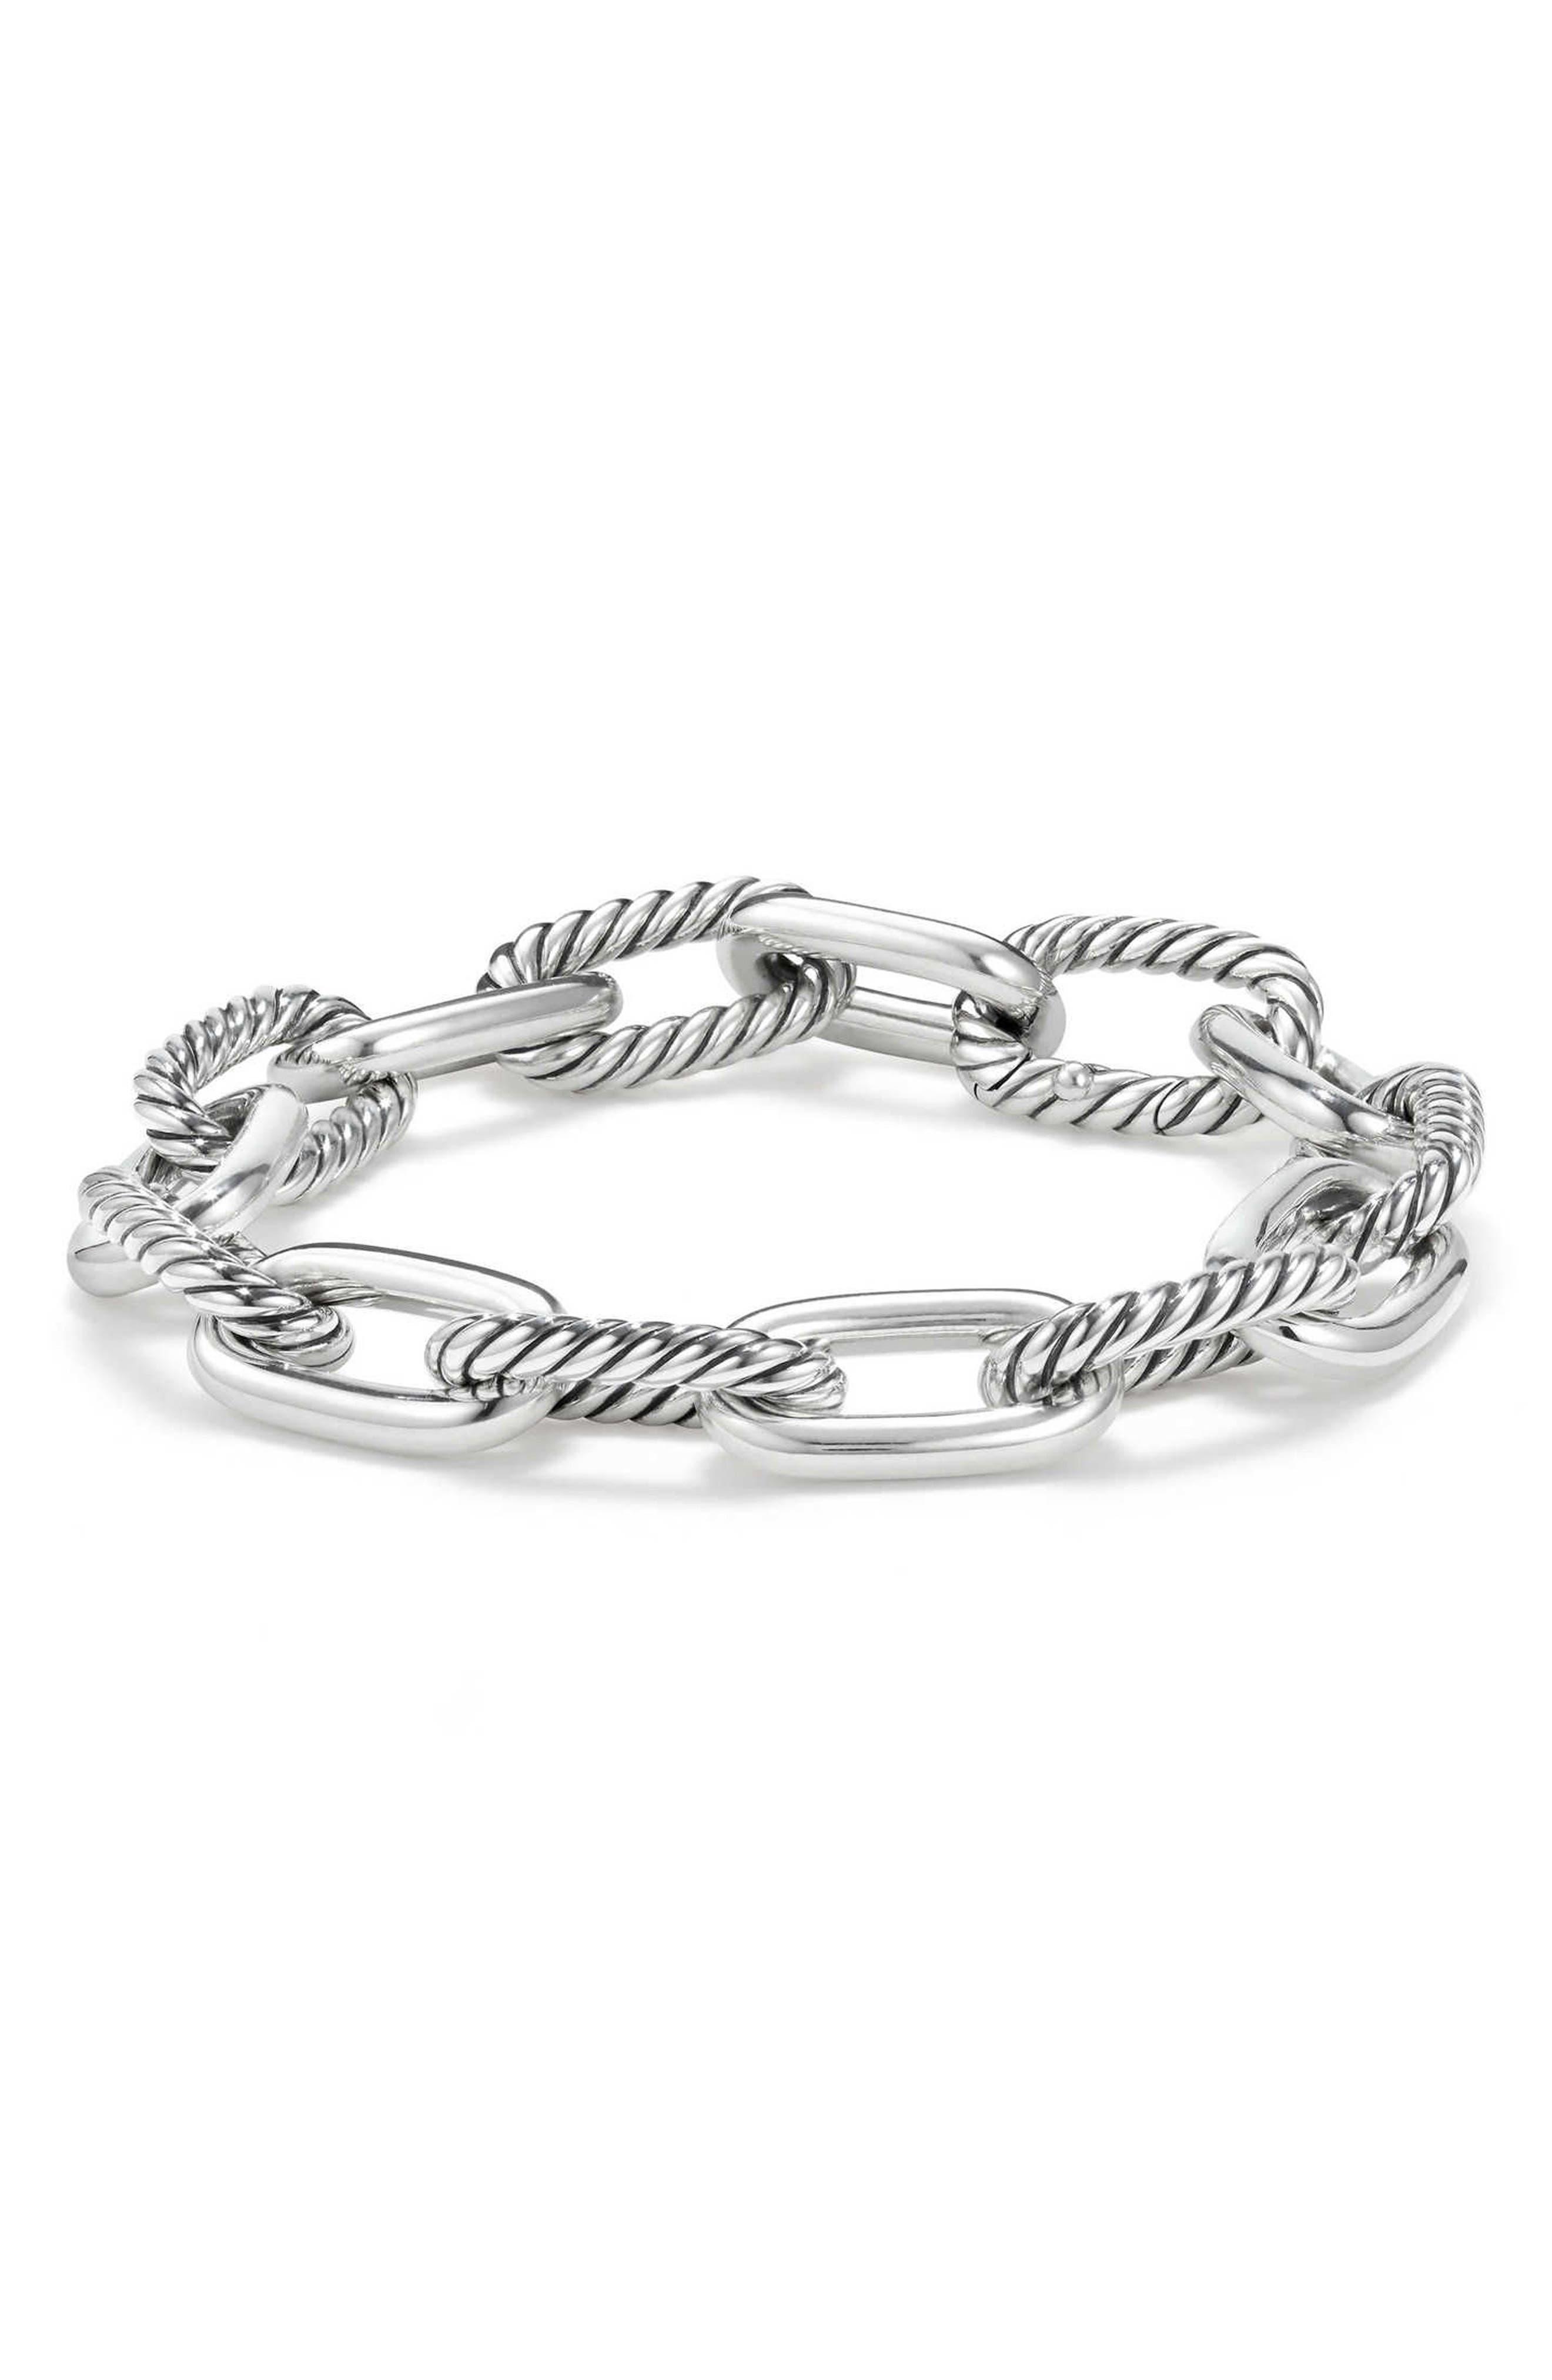 DY Madison Chain Medium Bracelet,                         Main,                         color, Silver